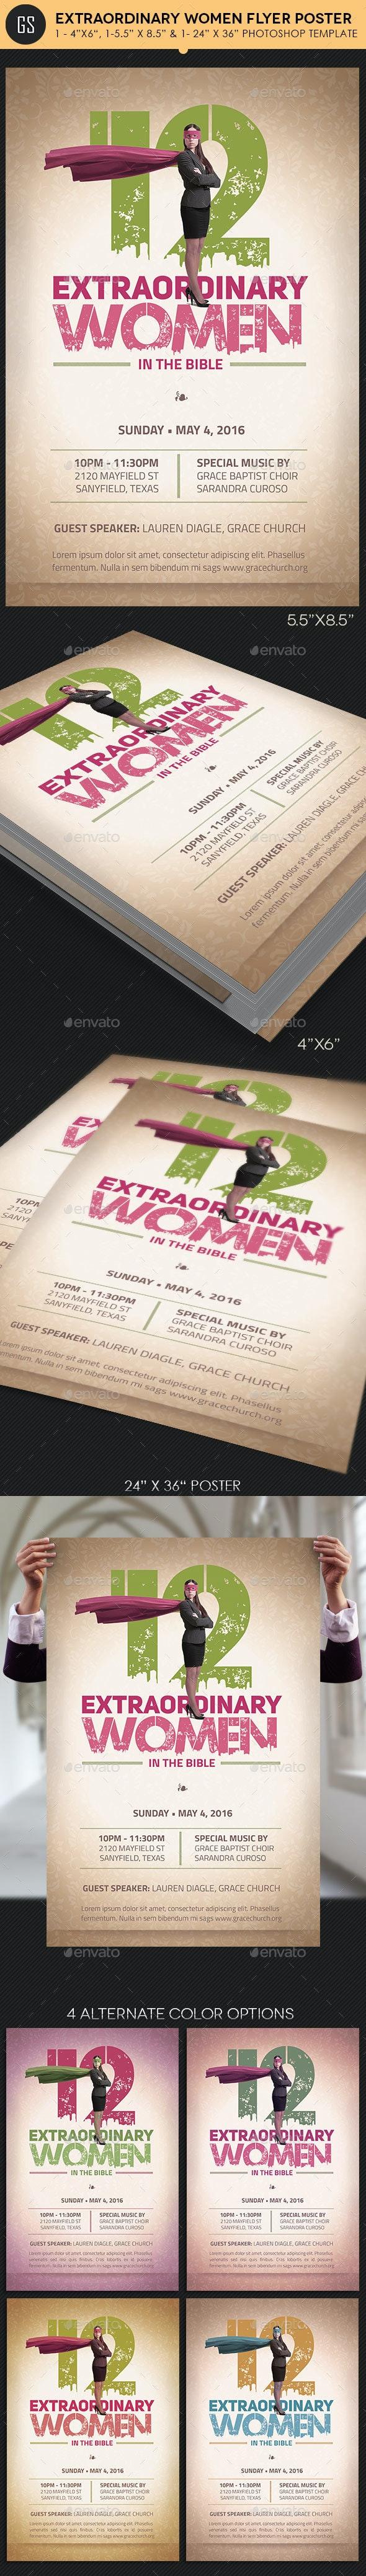 Women Flyer Plus Poster Template - Church Flyers